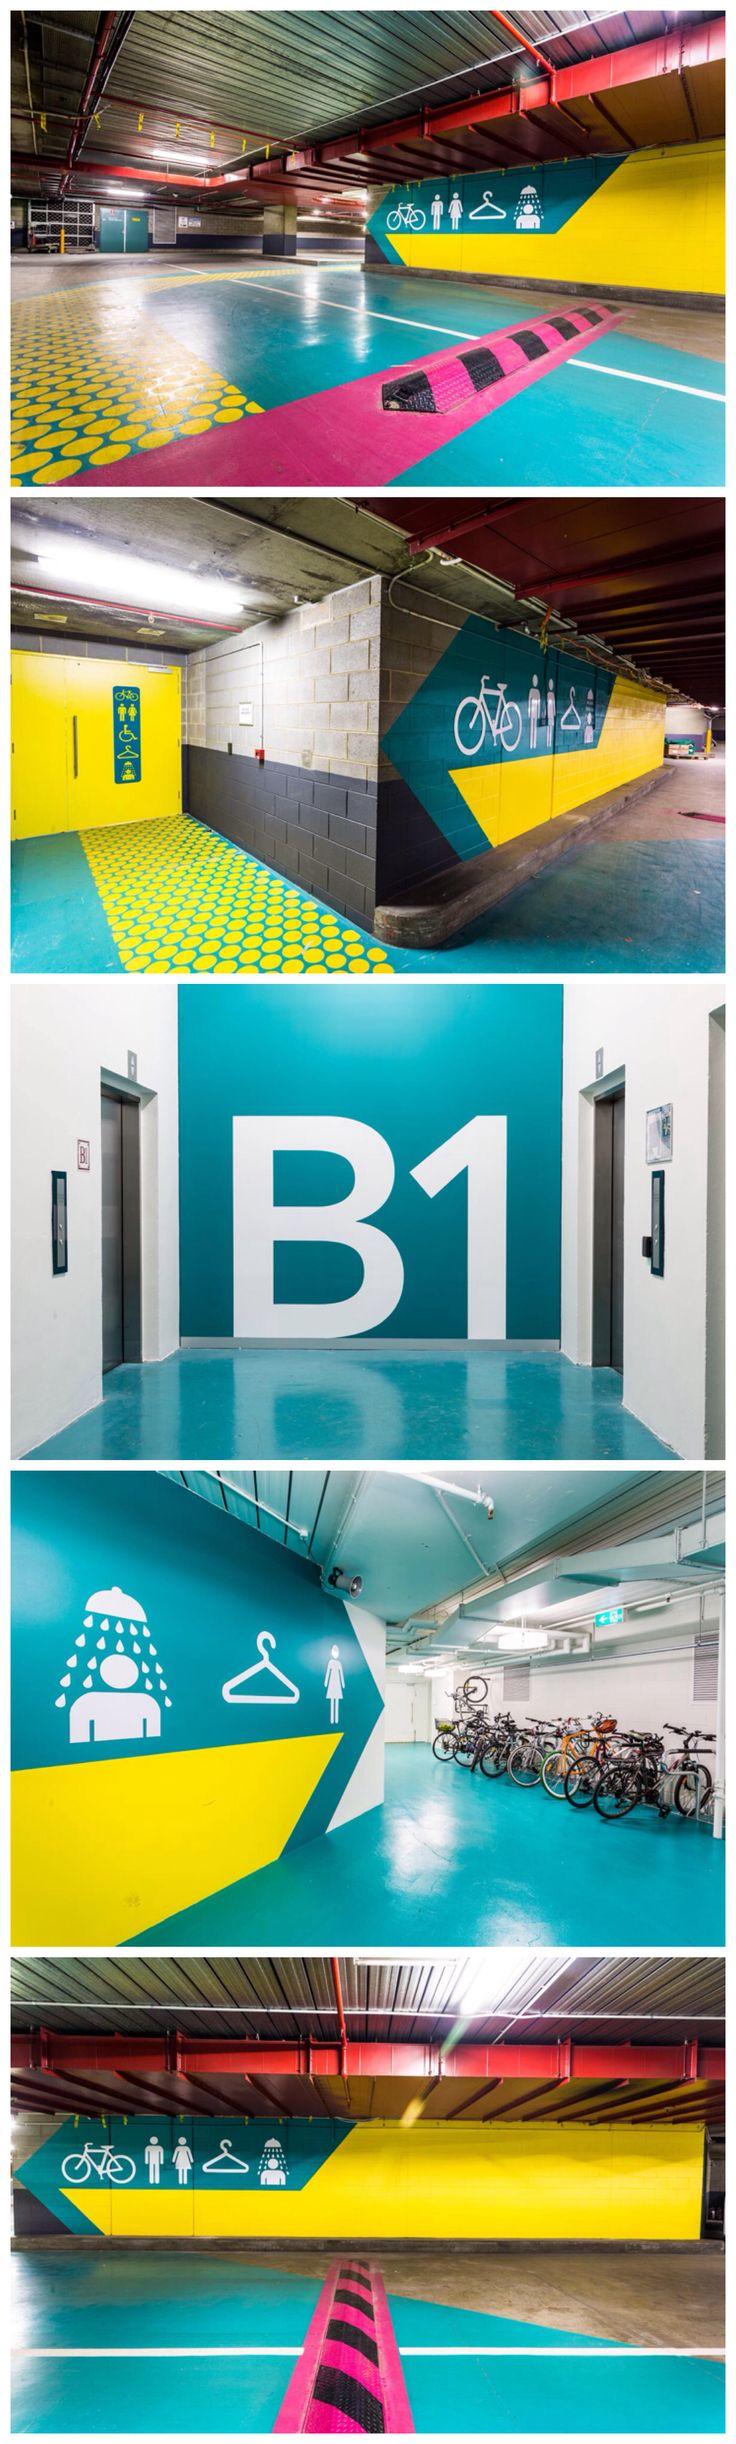 Wayfinding & Environmental graphics for Casselden basement carpark. Anothermattryan for Graypuksand AMR2013 Photography Mark Duffus @ MD PhotoG